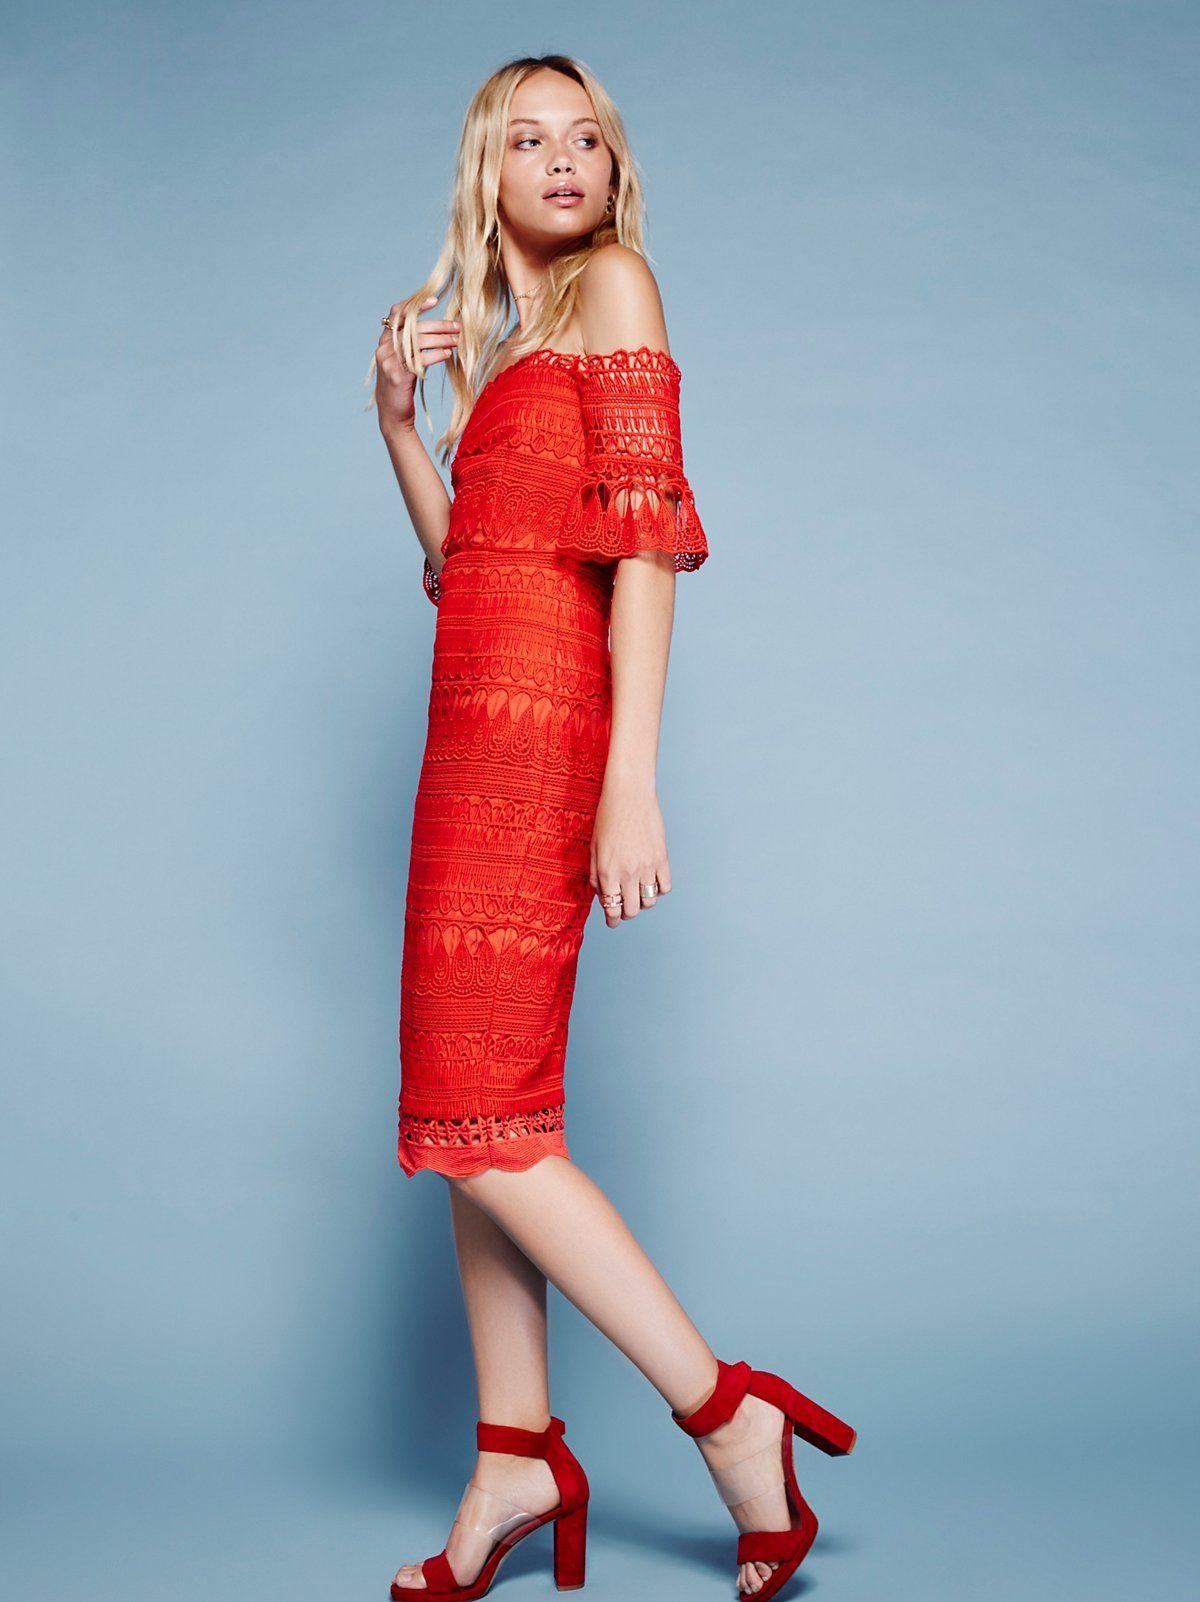 Mariah Midi Dress Red Midi Dress Crochet Midi Dress Long Sleeve Embroidered Dress